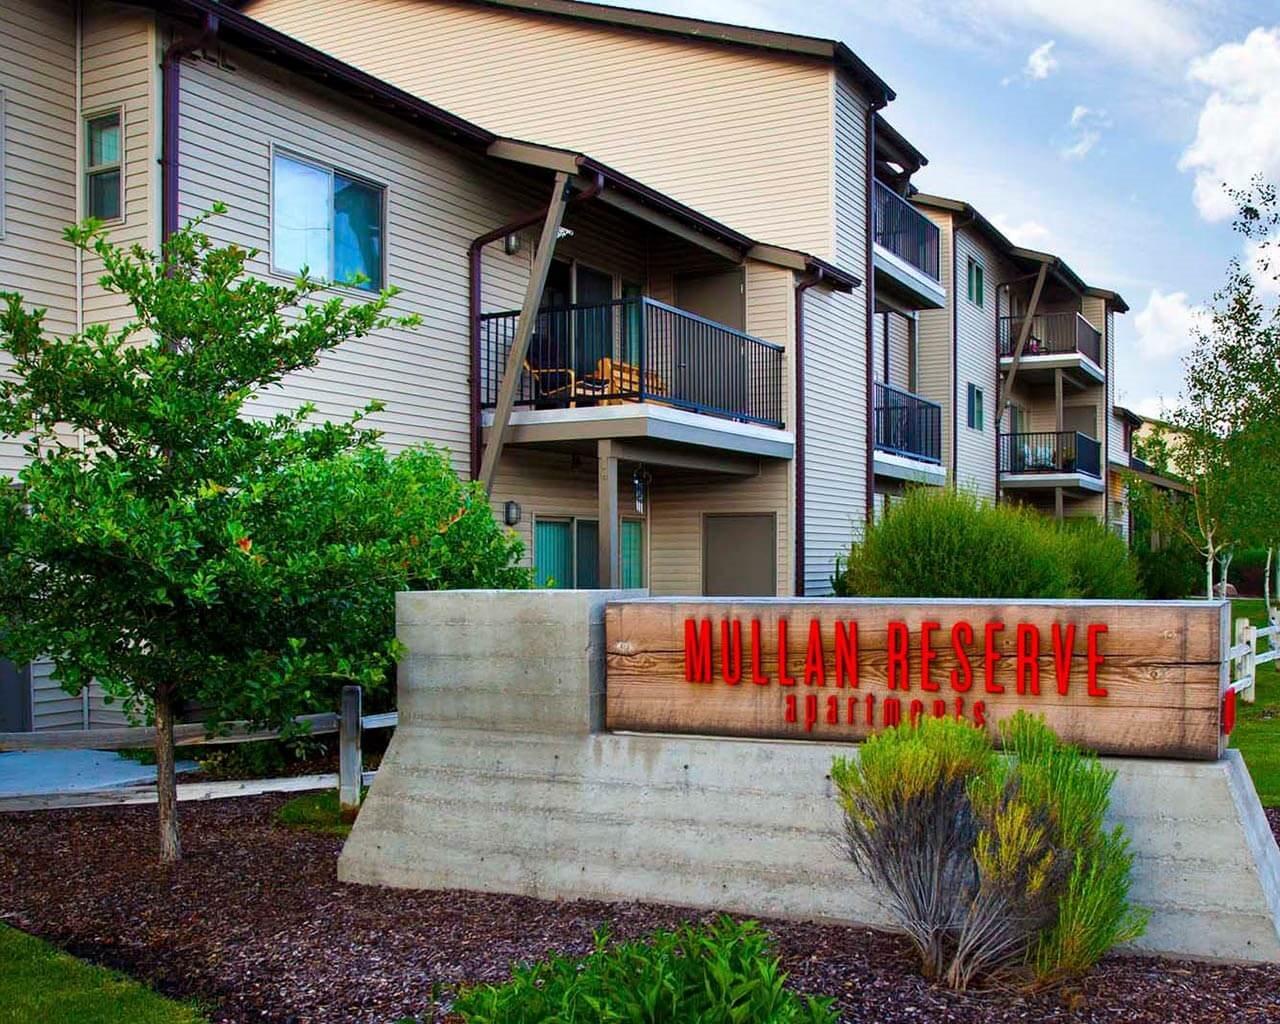 Property Signage at Mullan Reserve, Missoula, MT, 59808